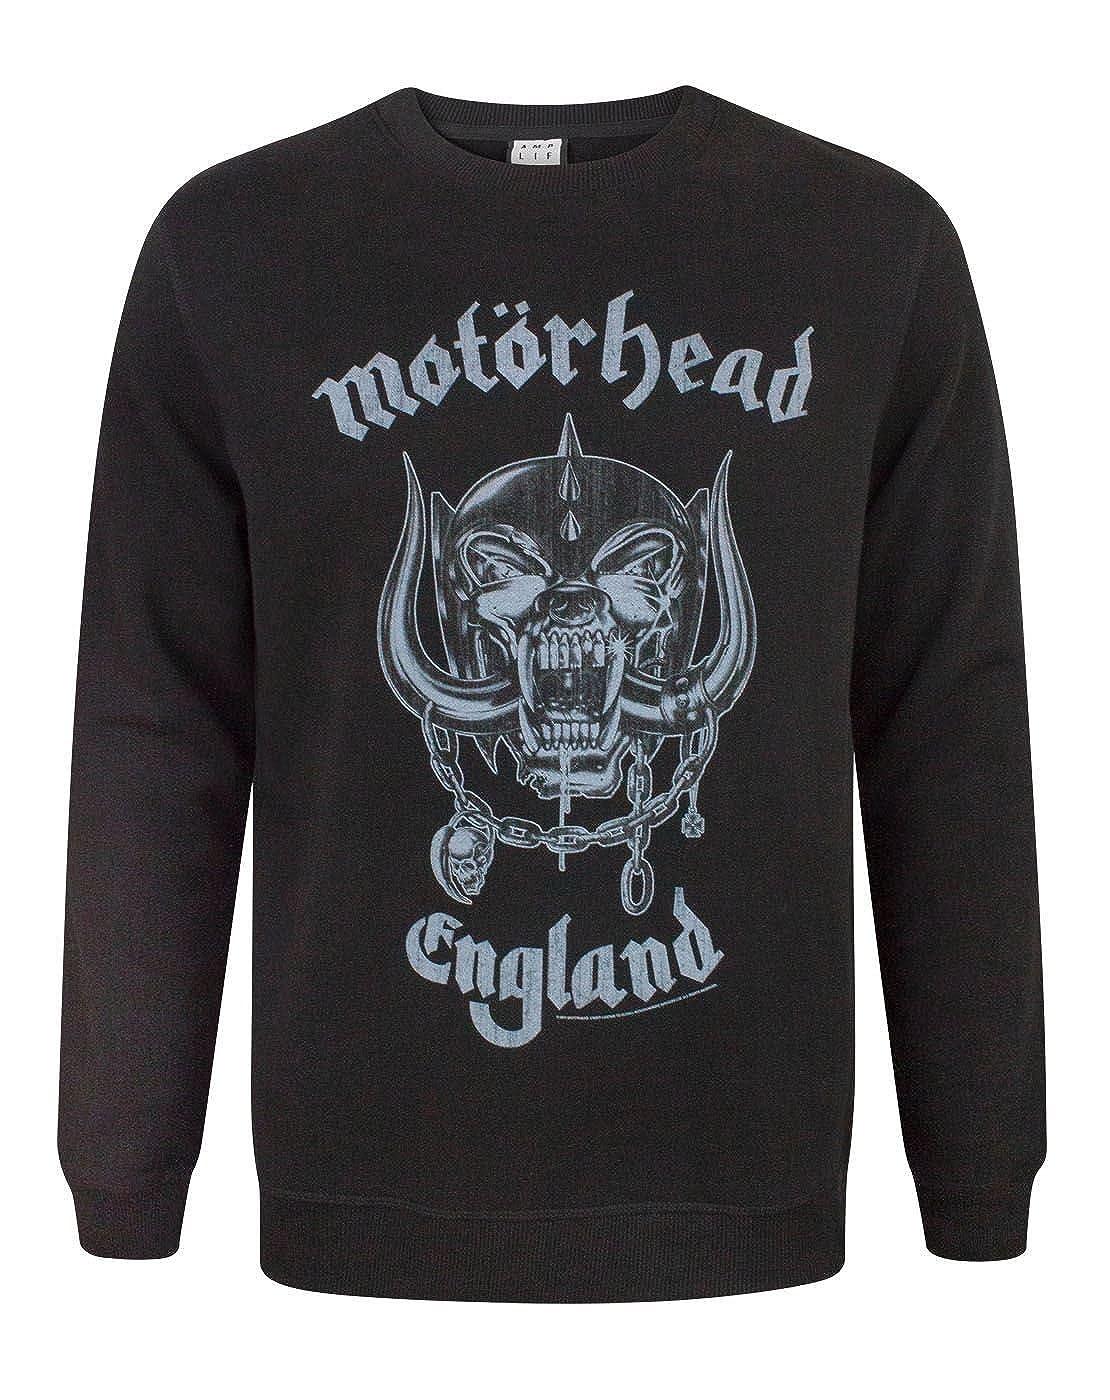 Amplified Motorhead England Men& 039;s Sweatshirt